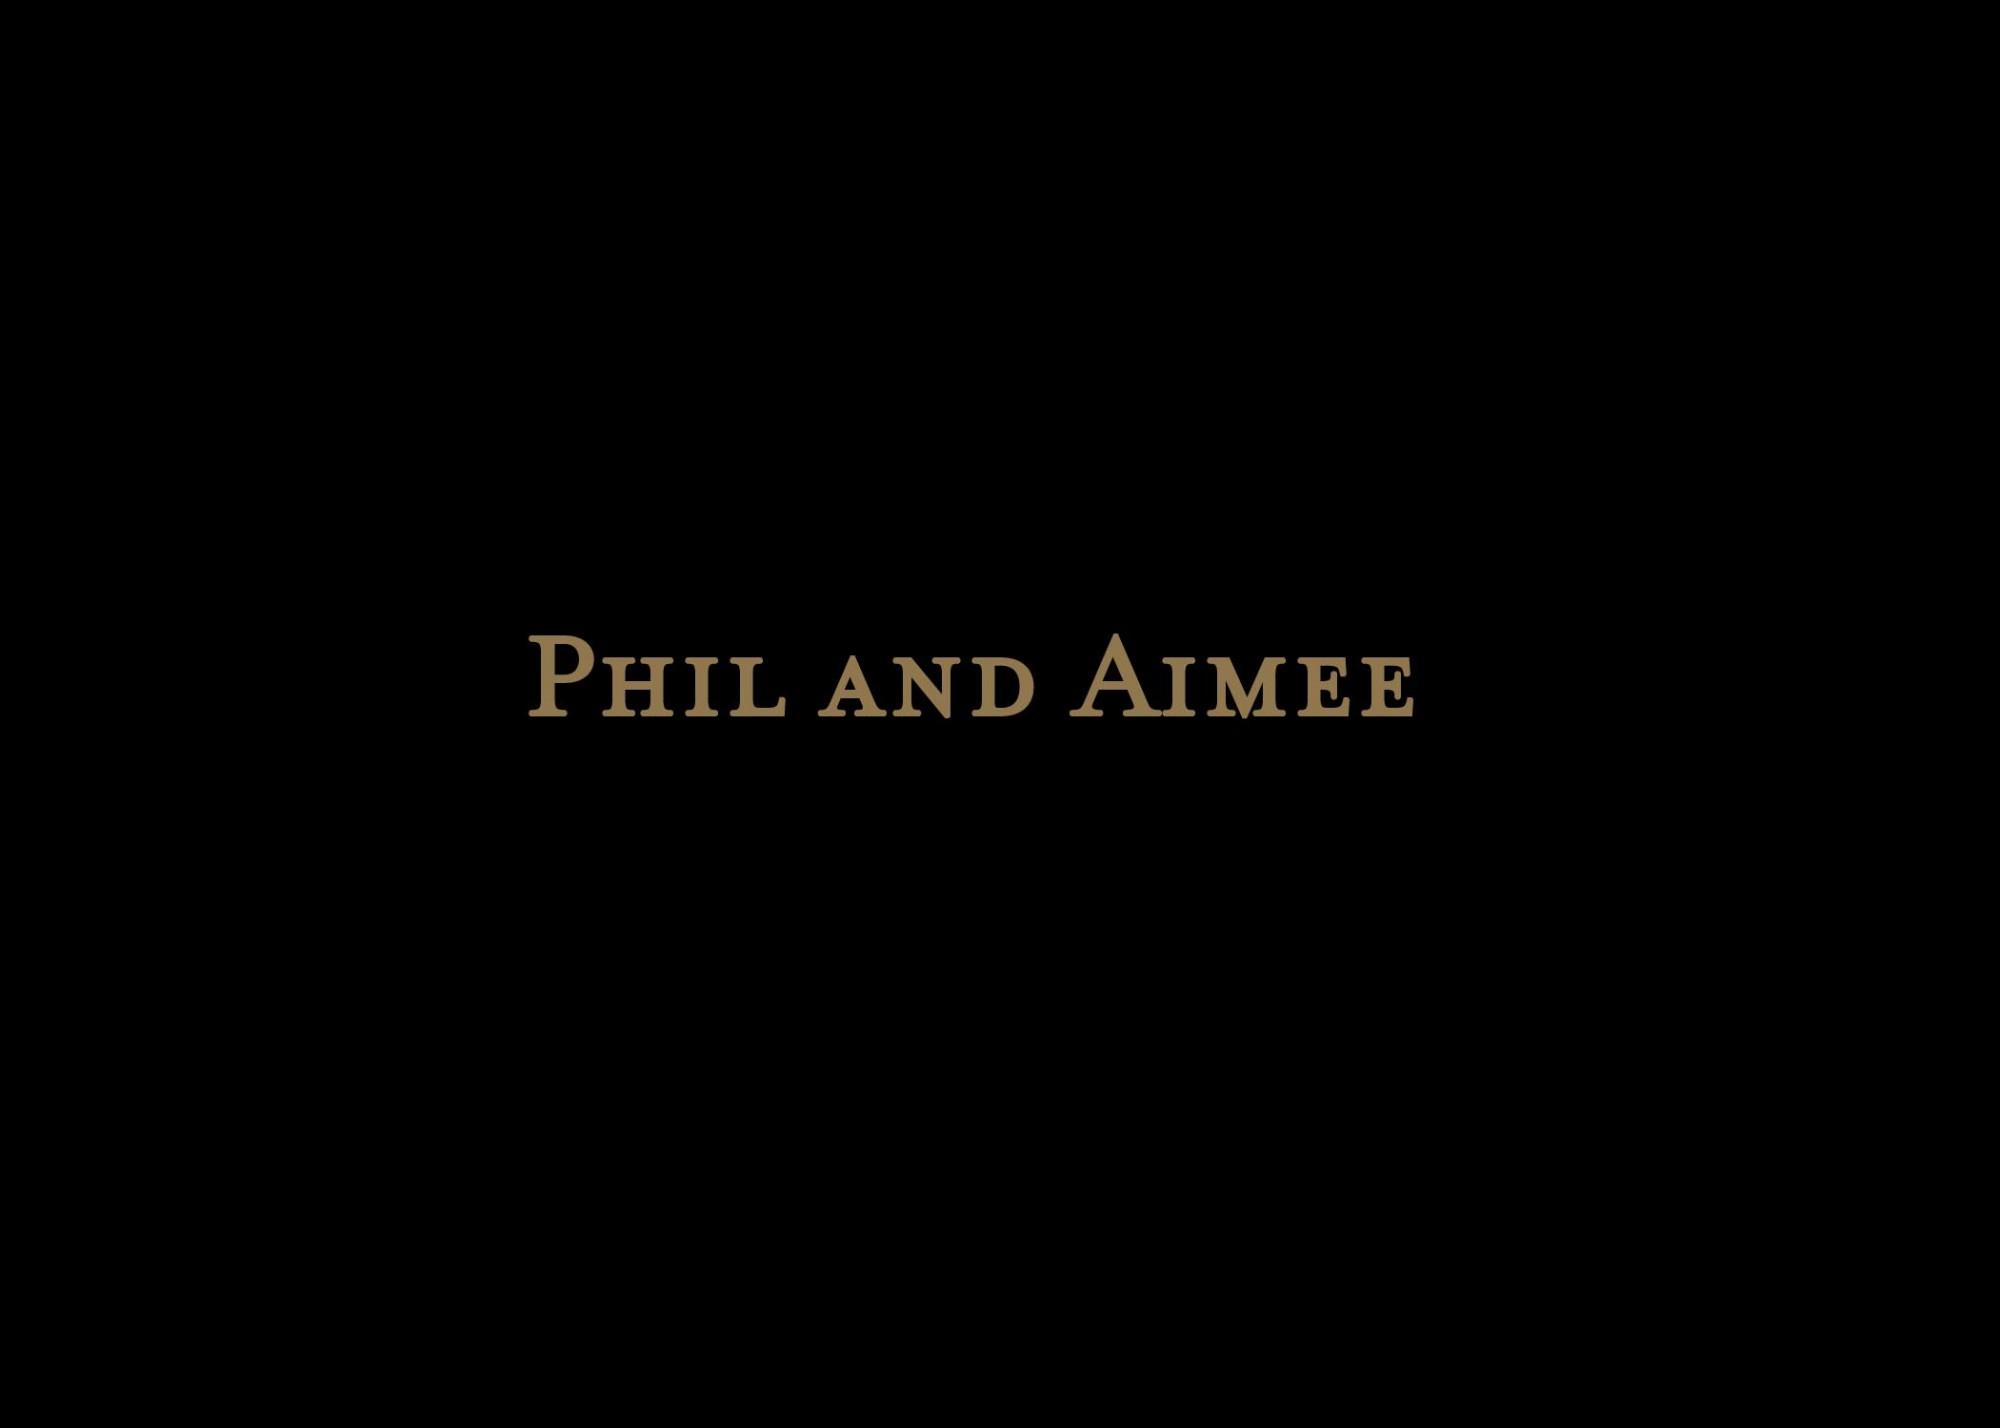 Aimee and Phil AVP